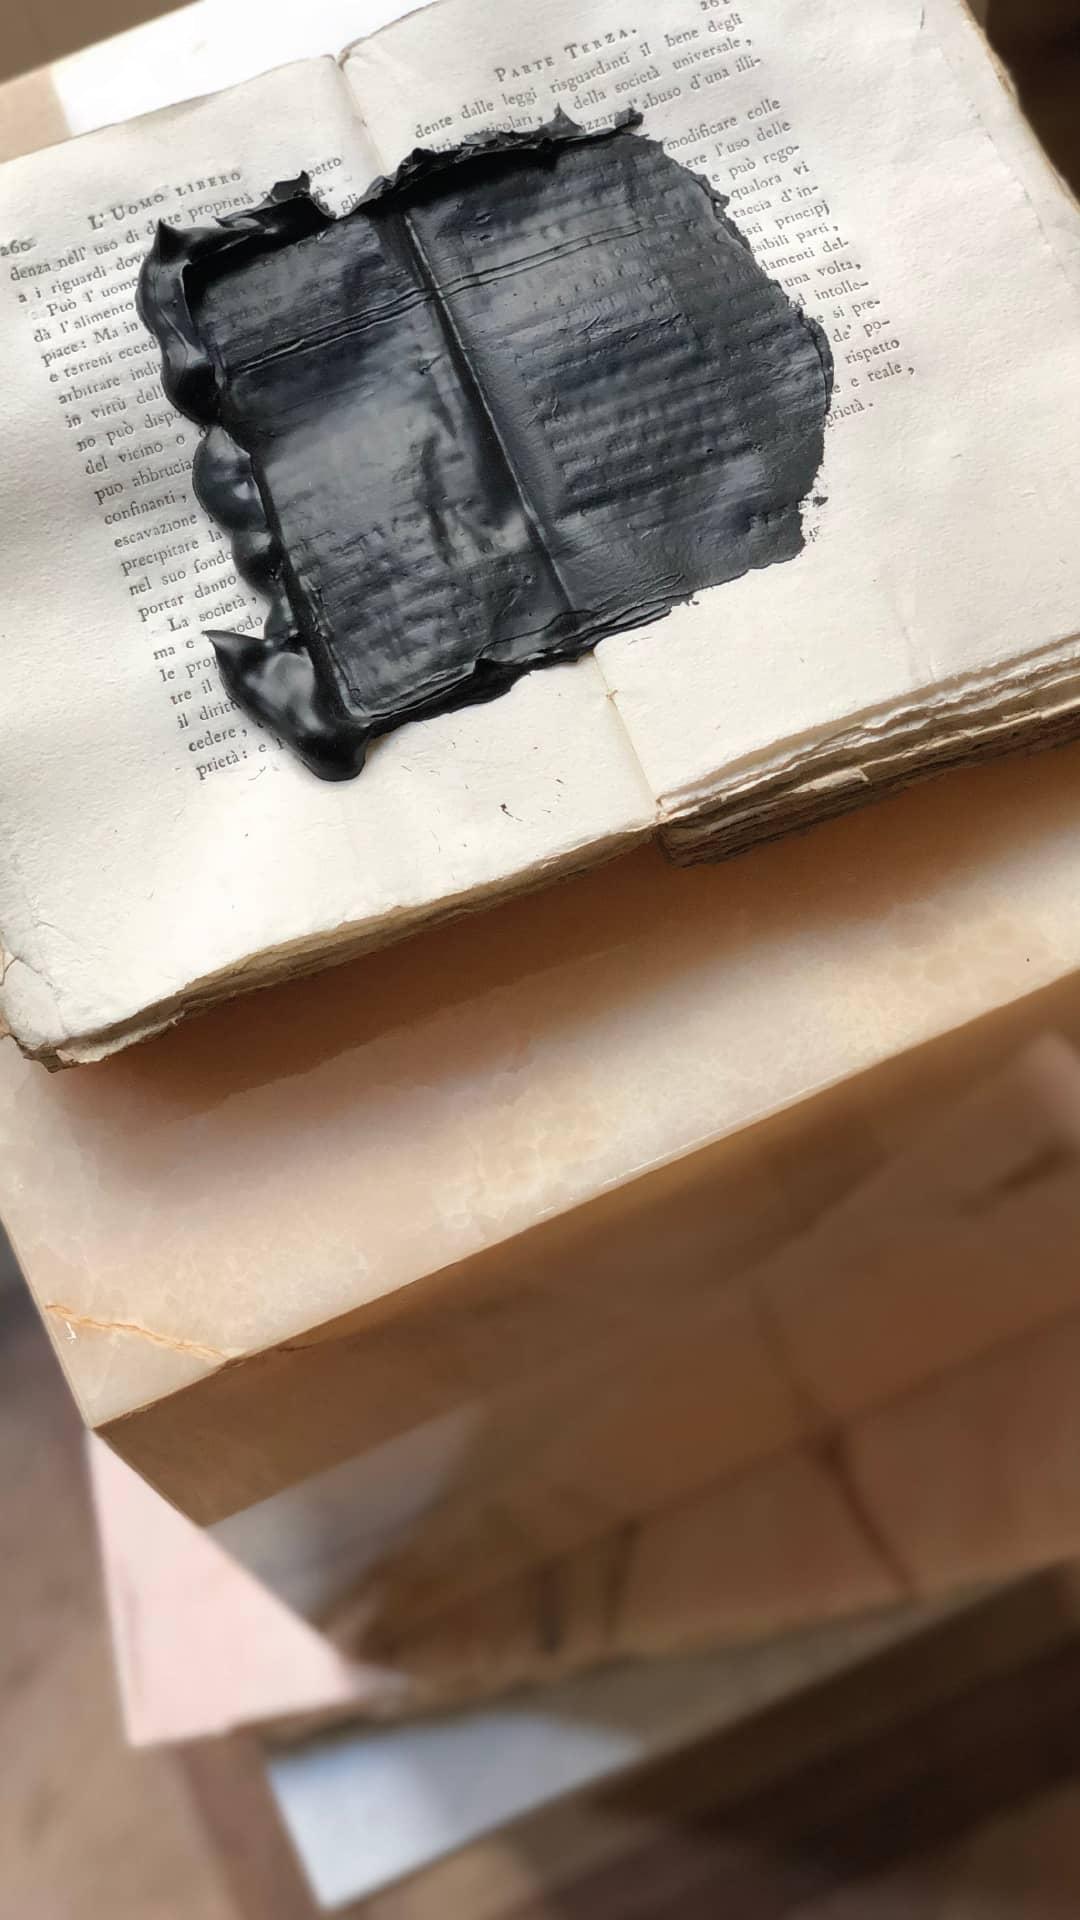 03-MARCOPOLO-AARON-NACHTAILER-ART-ARTIST-SCULPTURES-VERTICAL